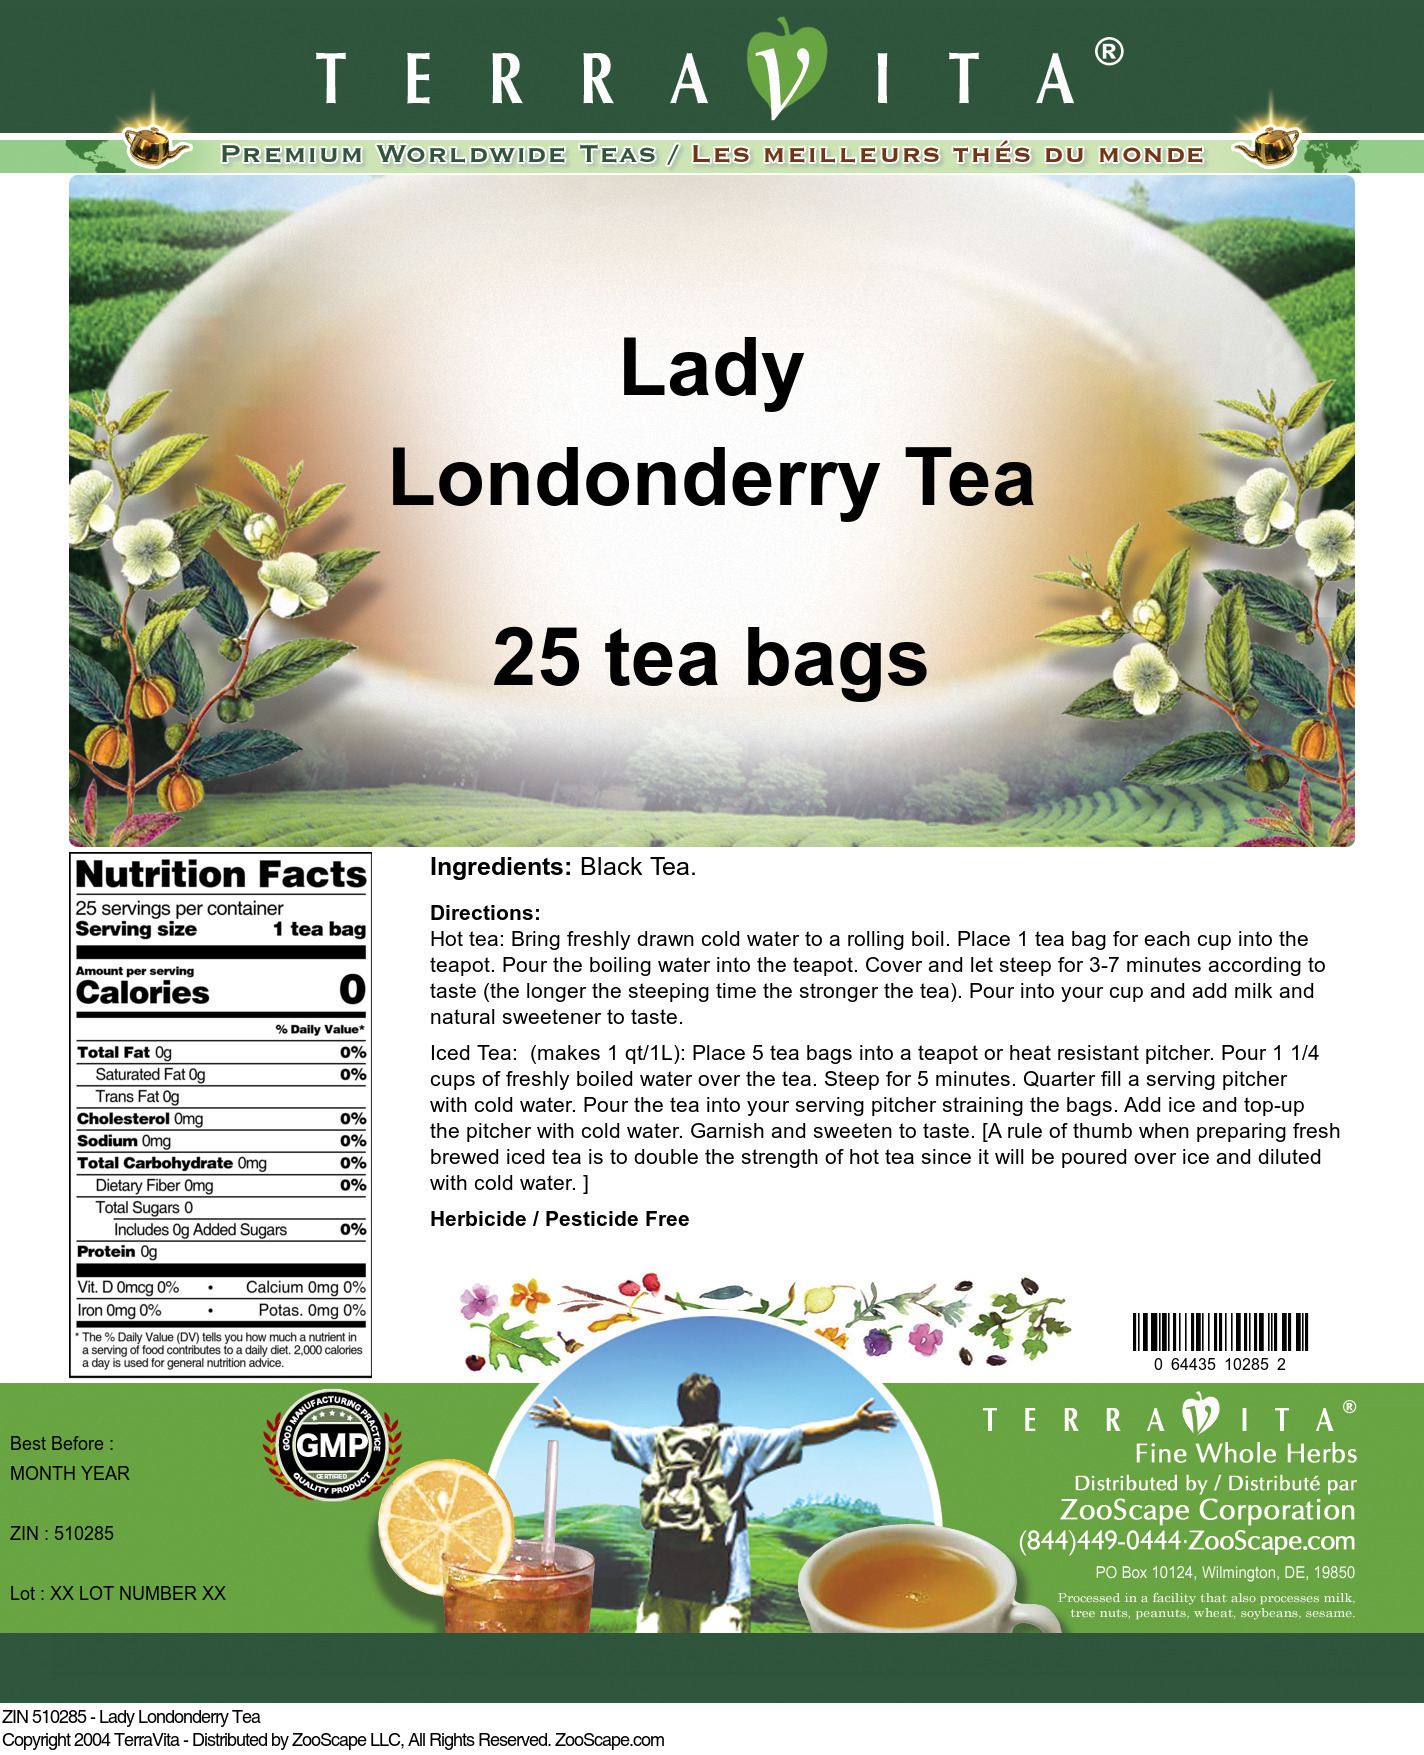 Lady Londonderry Tea